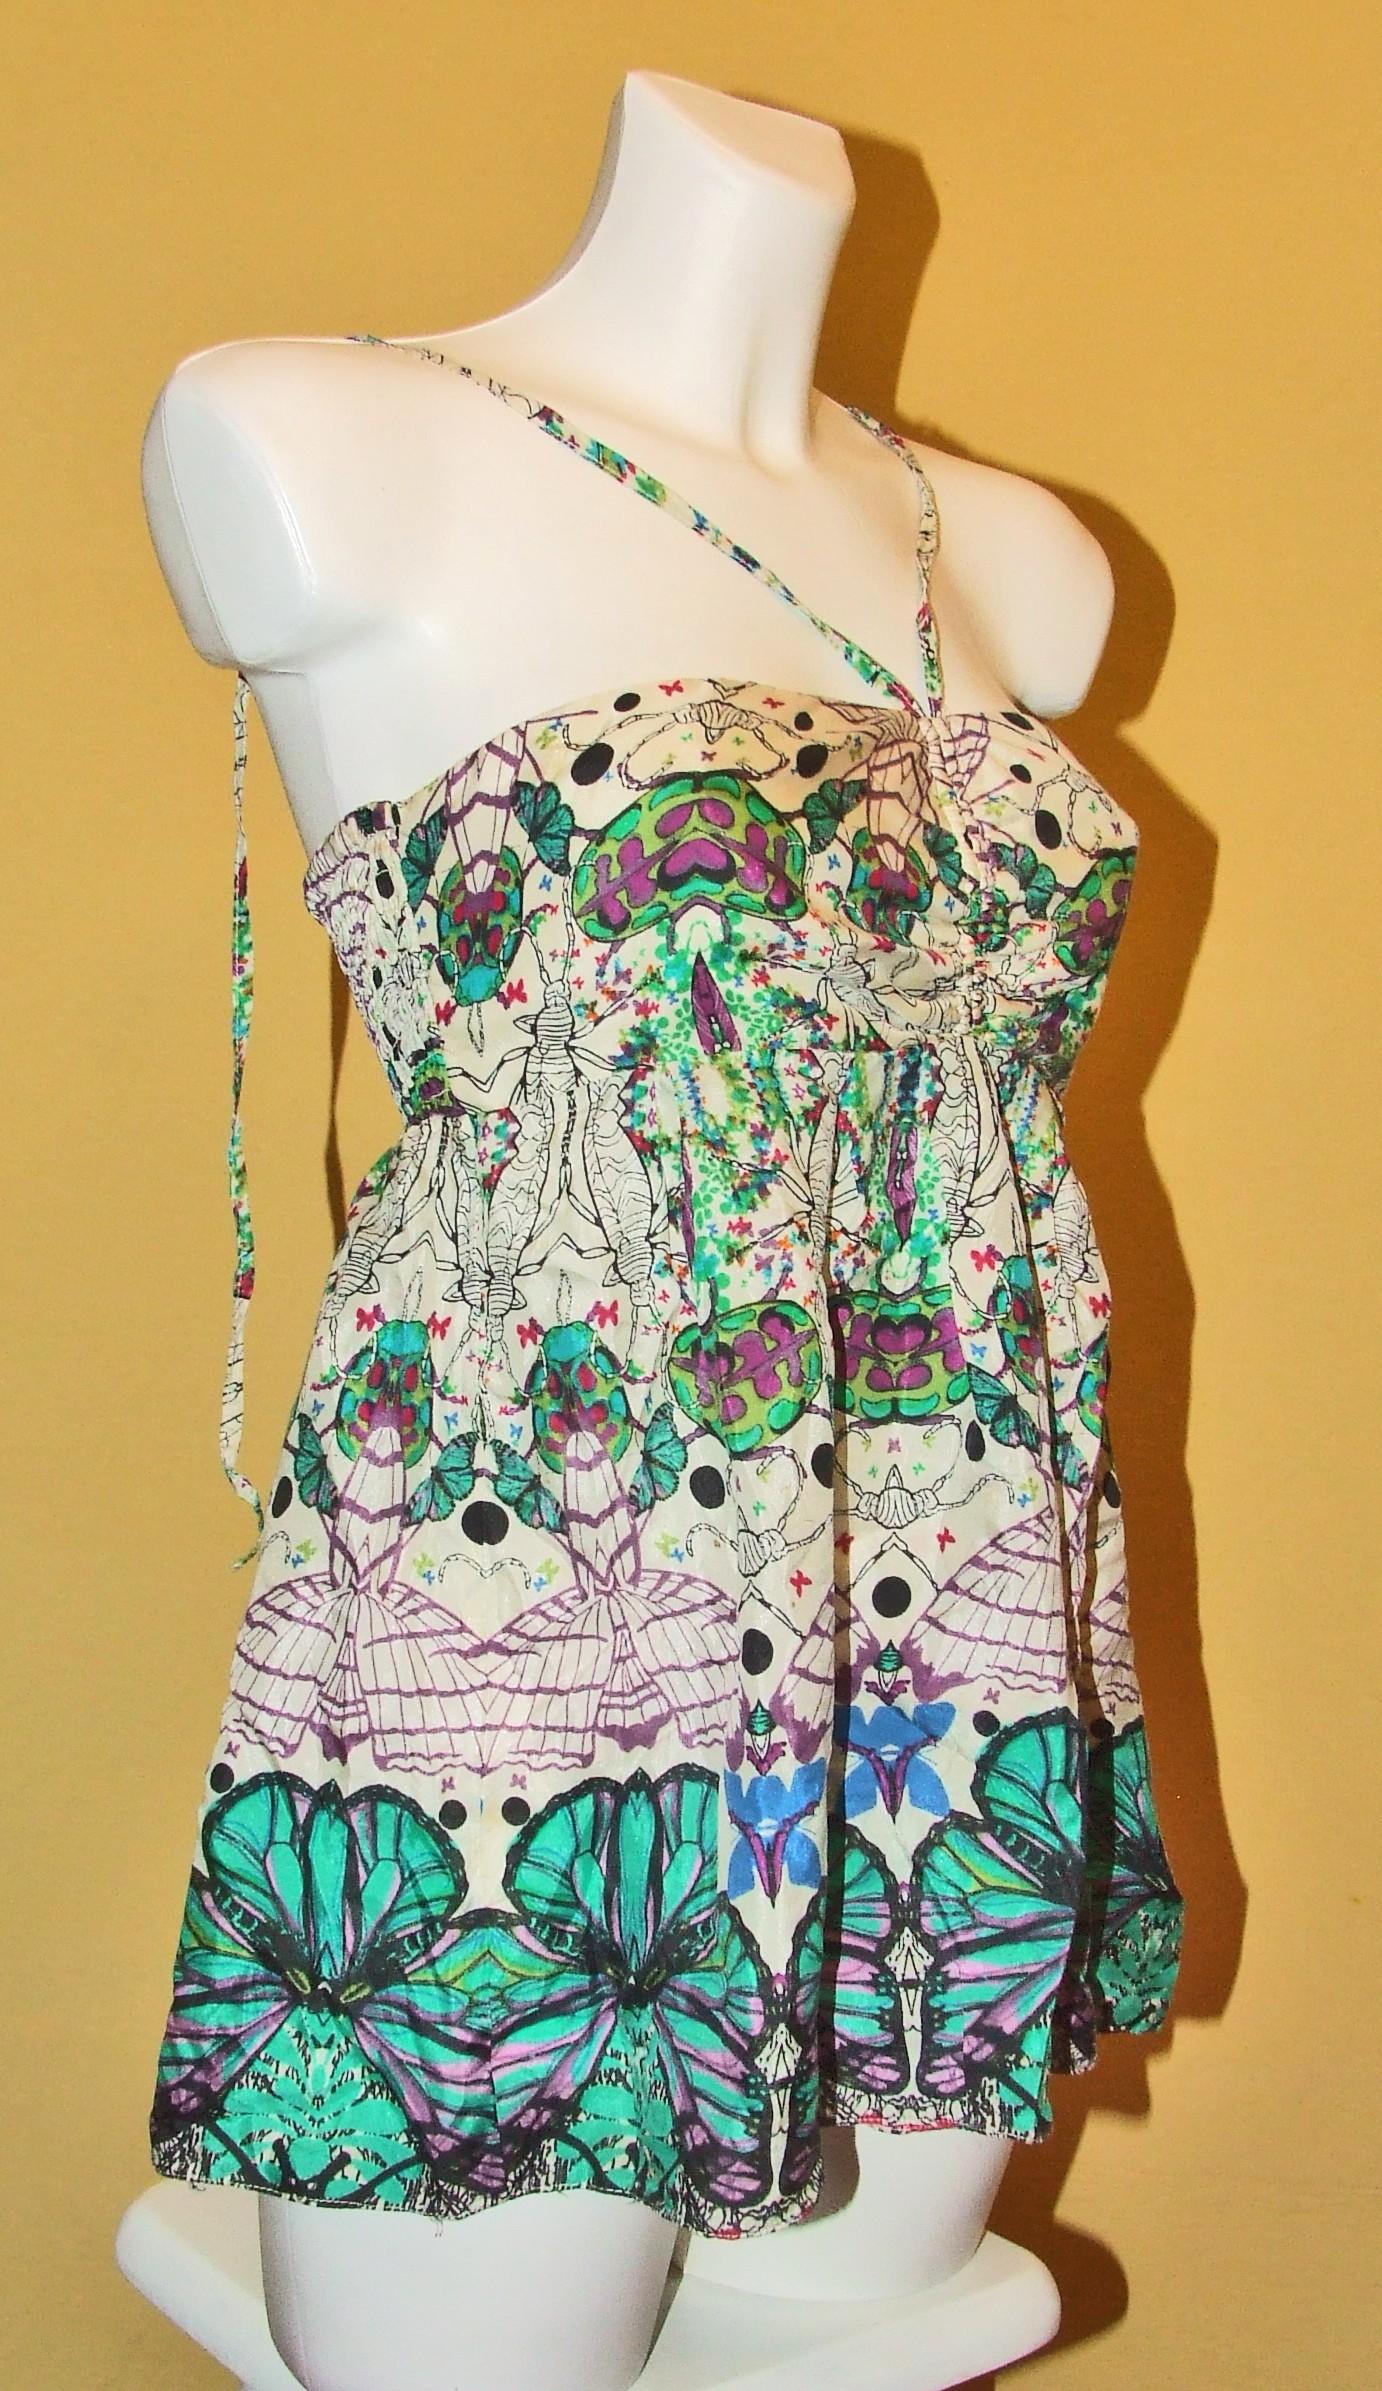 f4c3197ed7 MANGO sukienka plażowa sexy letnia lato lekka 36 S - 7423287969 ...